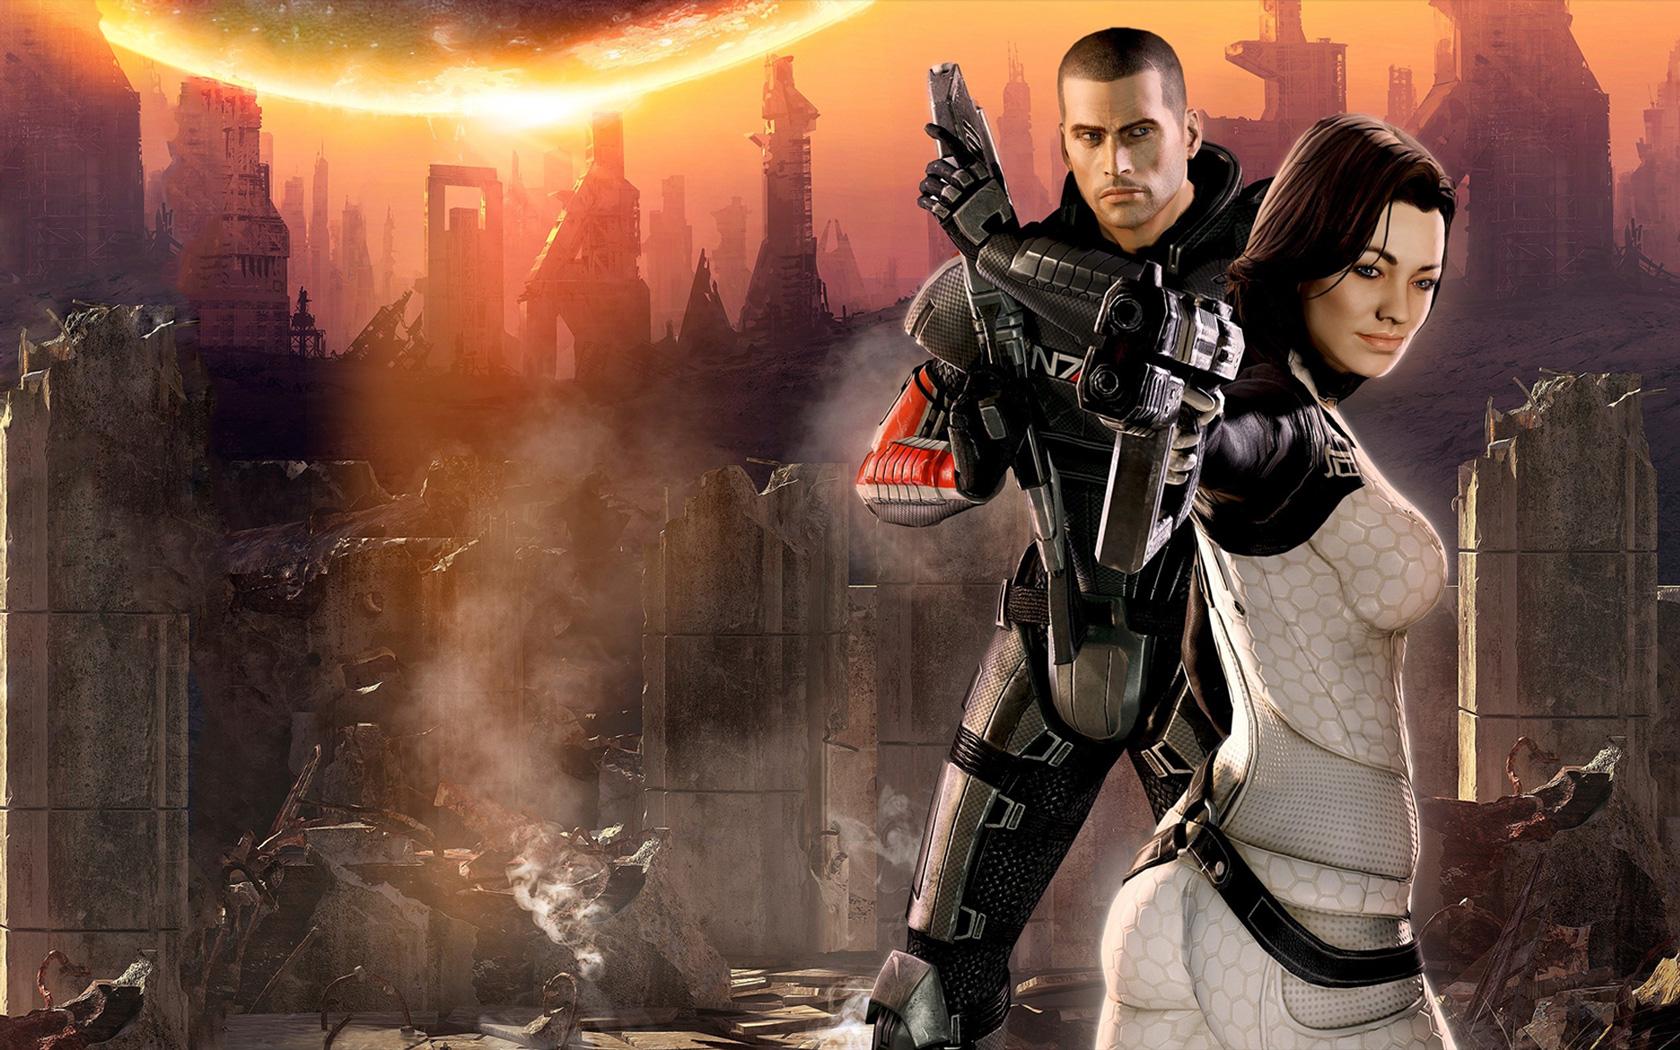 Free Mass Effect 2 Wallpaper in 1680x1050